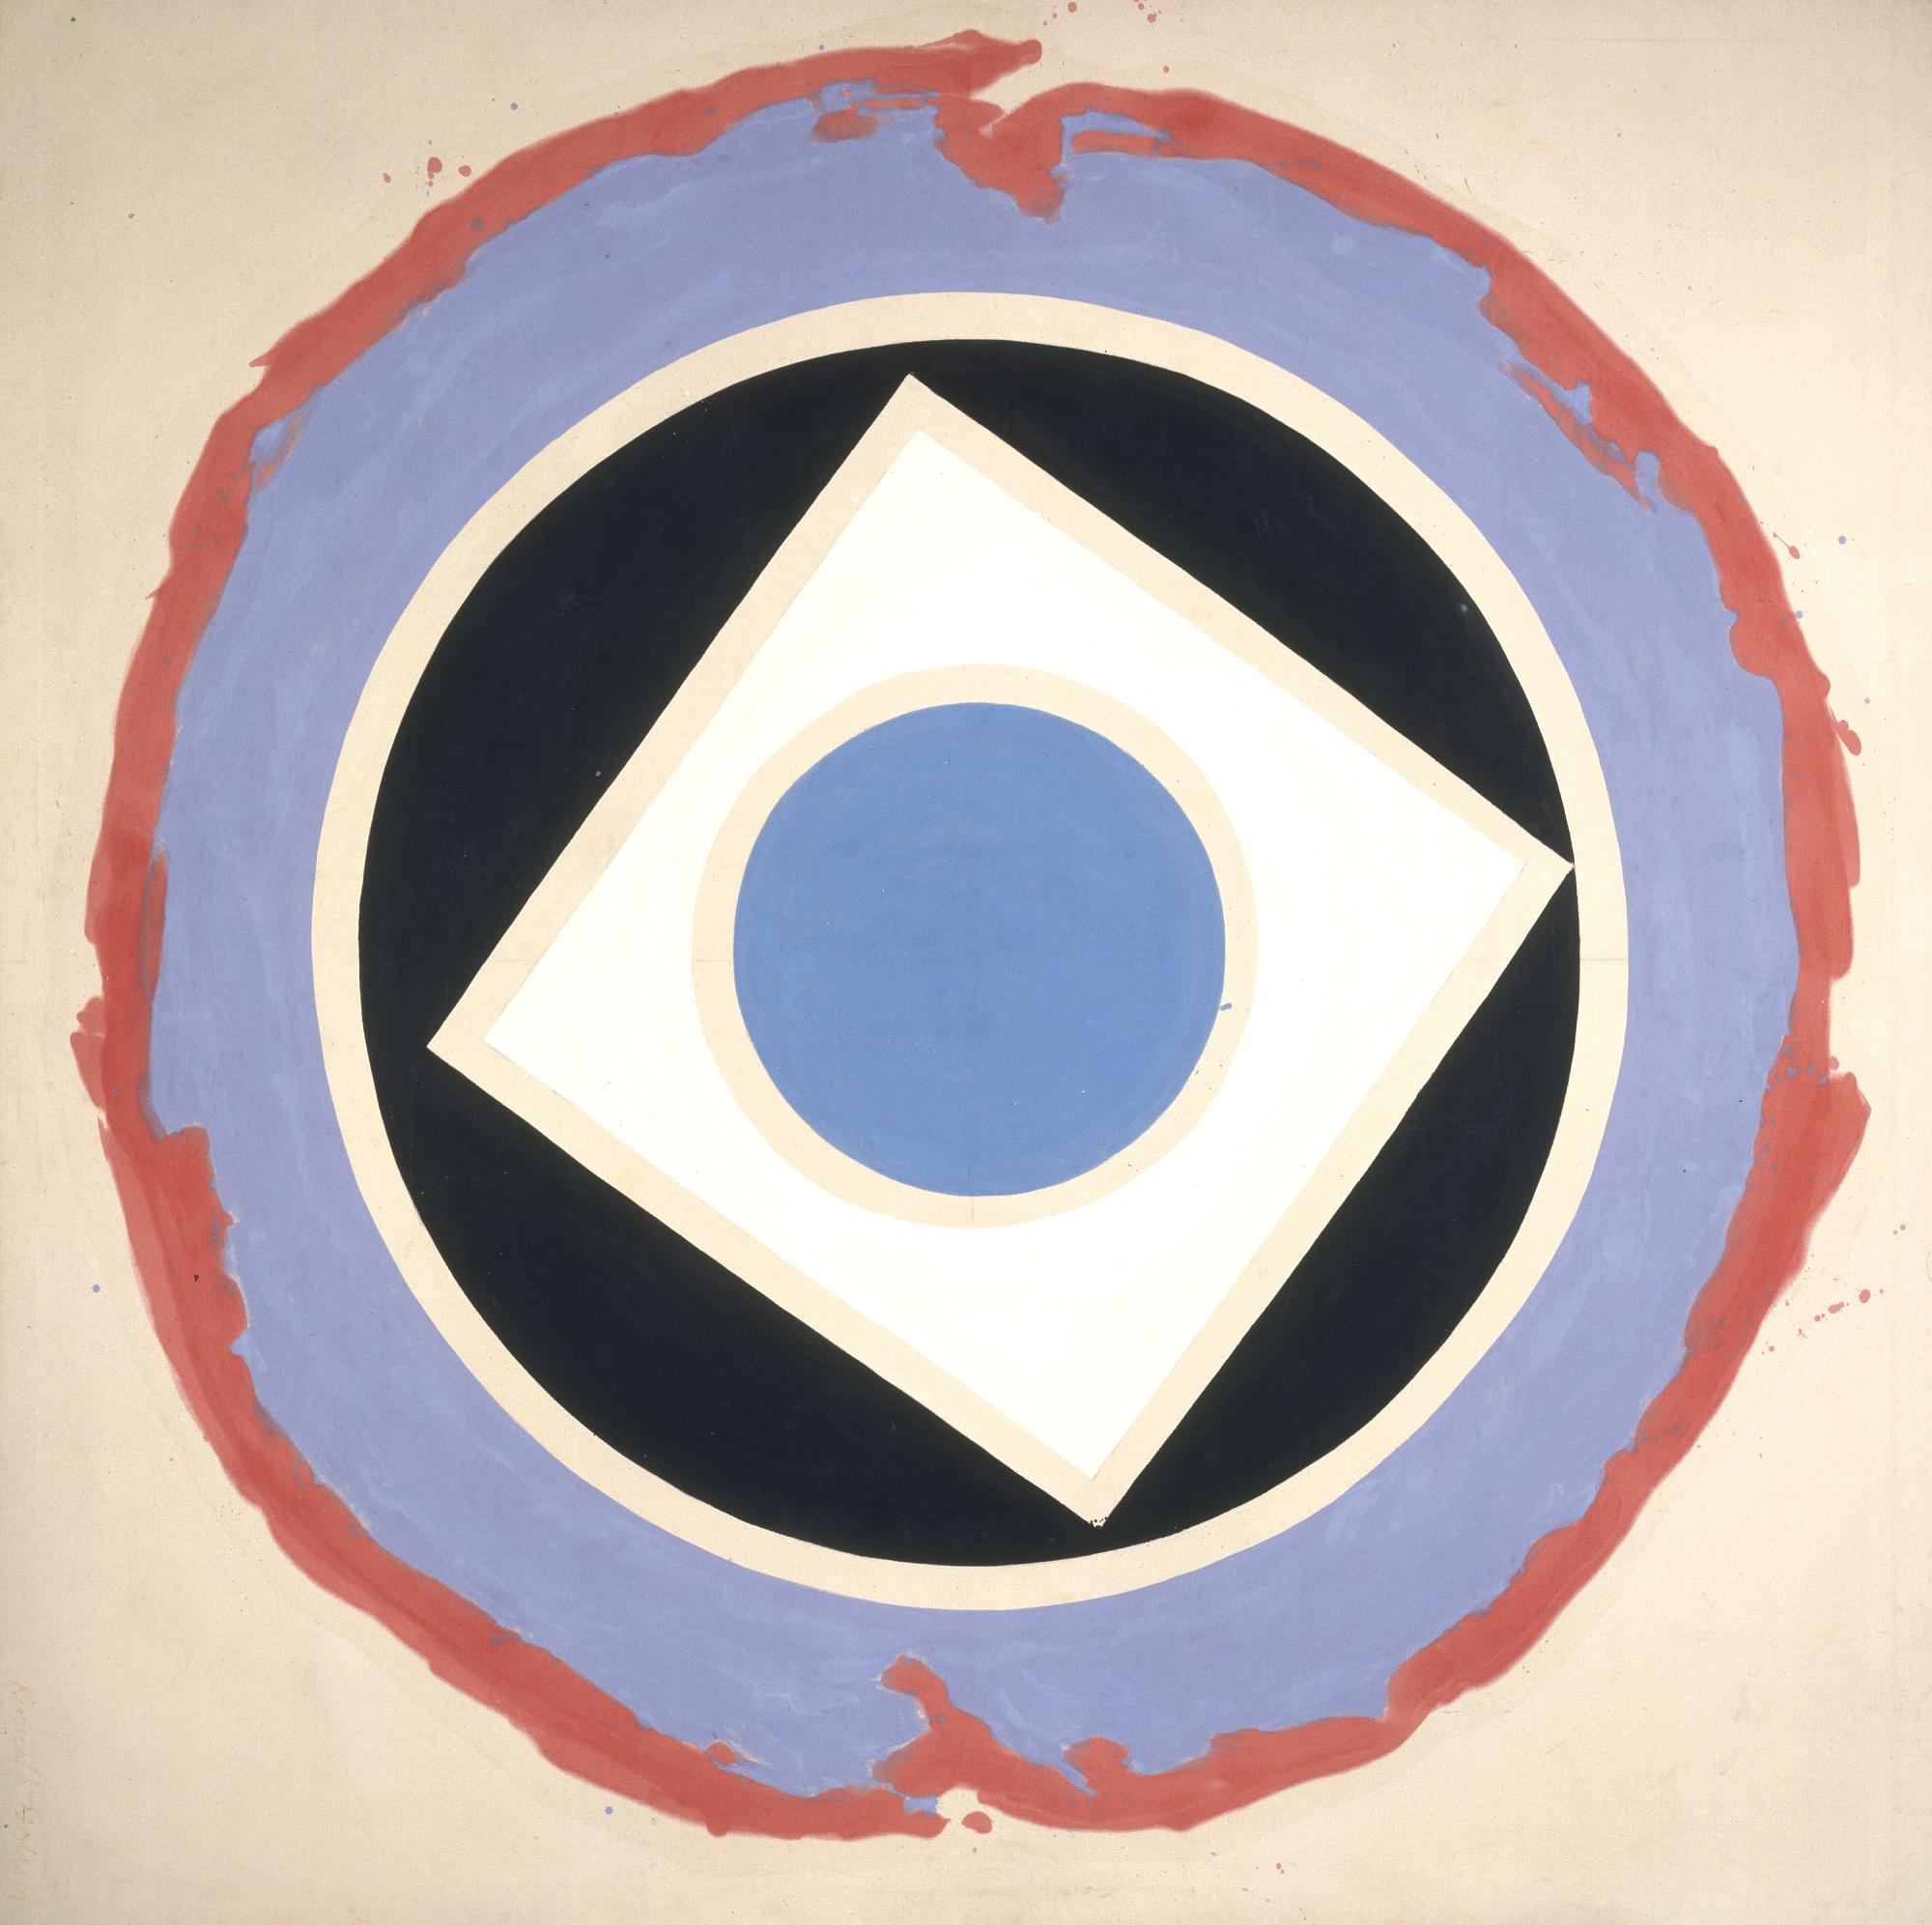 "Kenneth Noland, ""Split."" 1959. Acrylic on canvas, 94 x 94 inches."